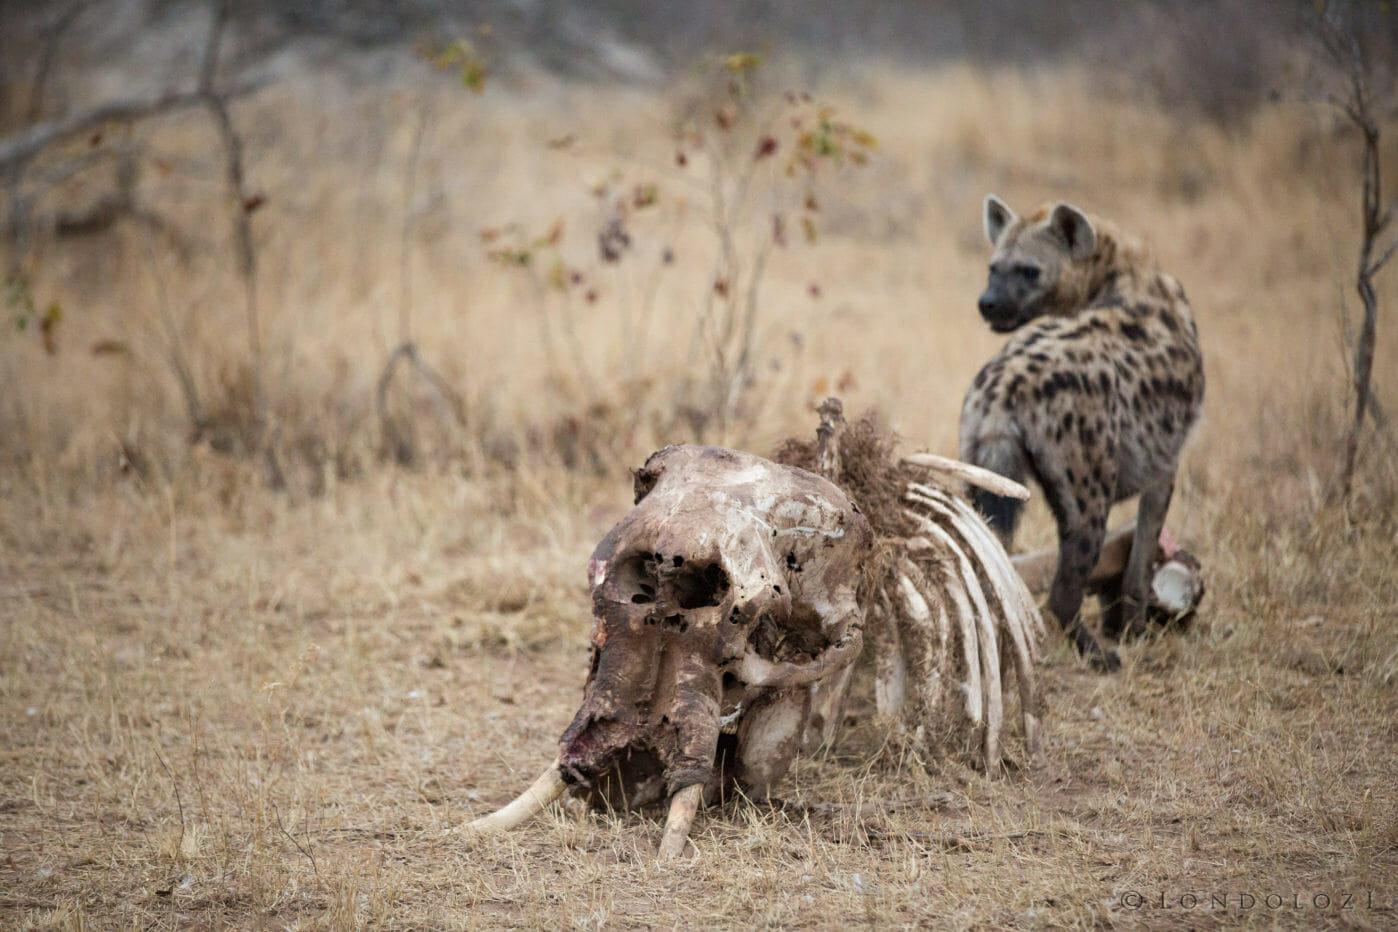 Elephant Carcass Hyena